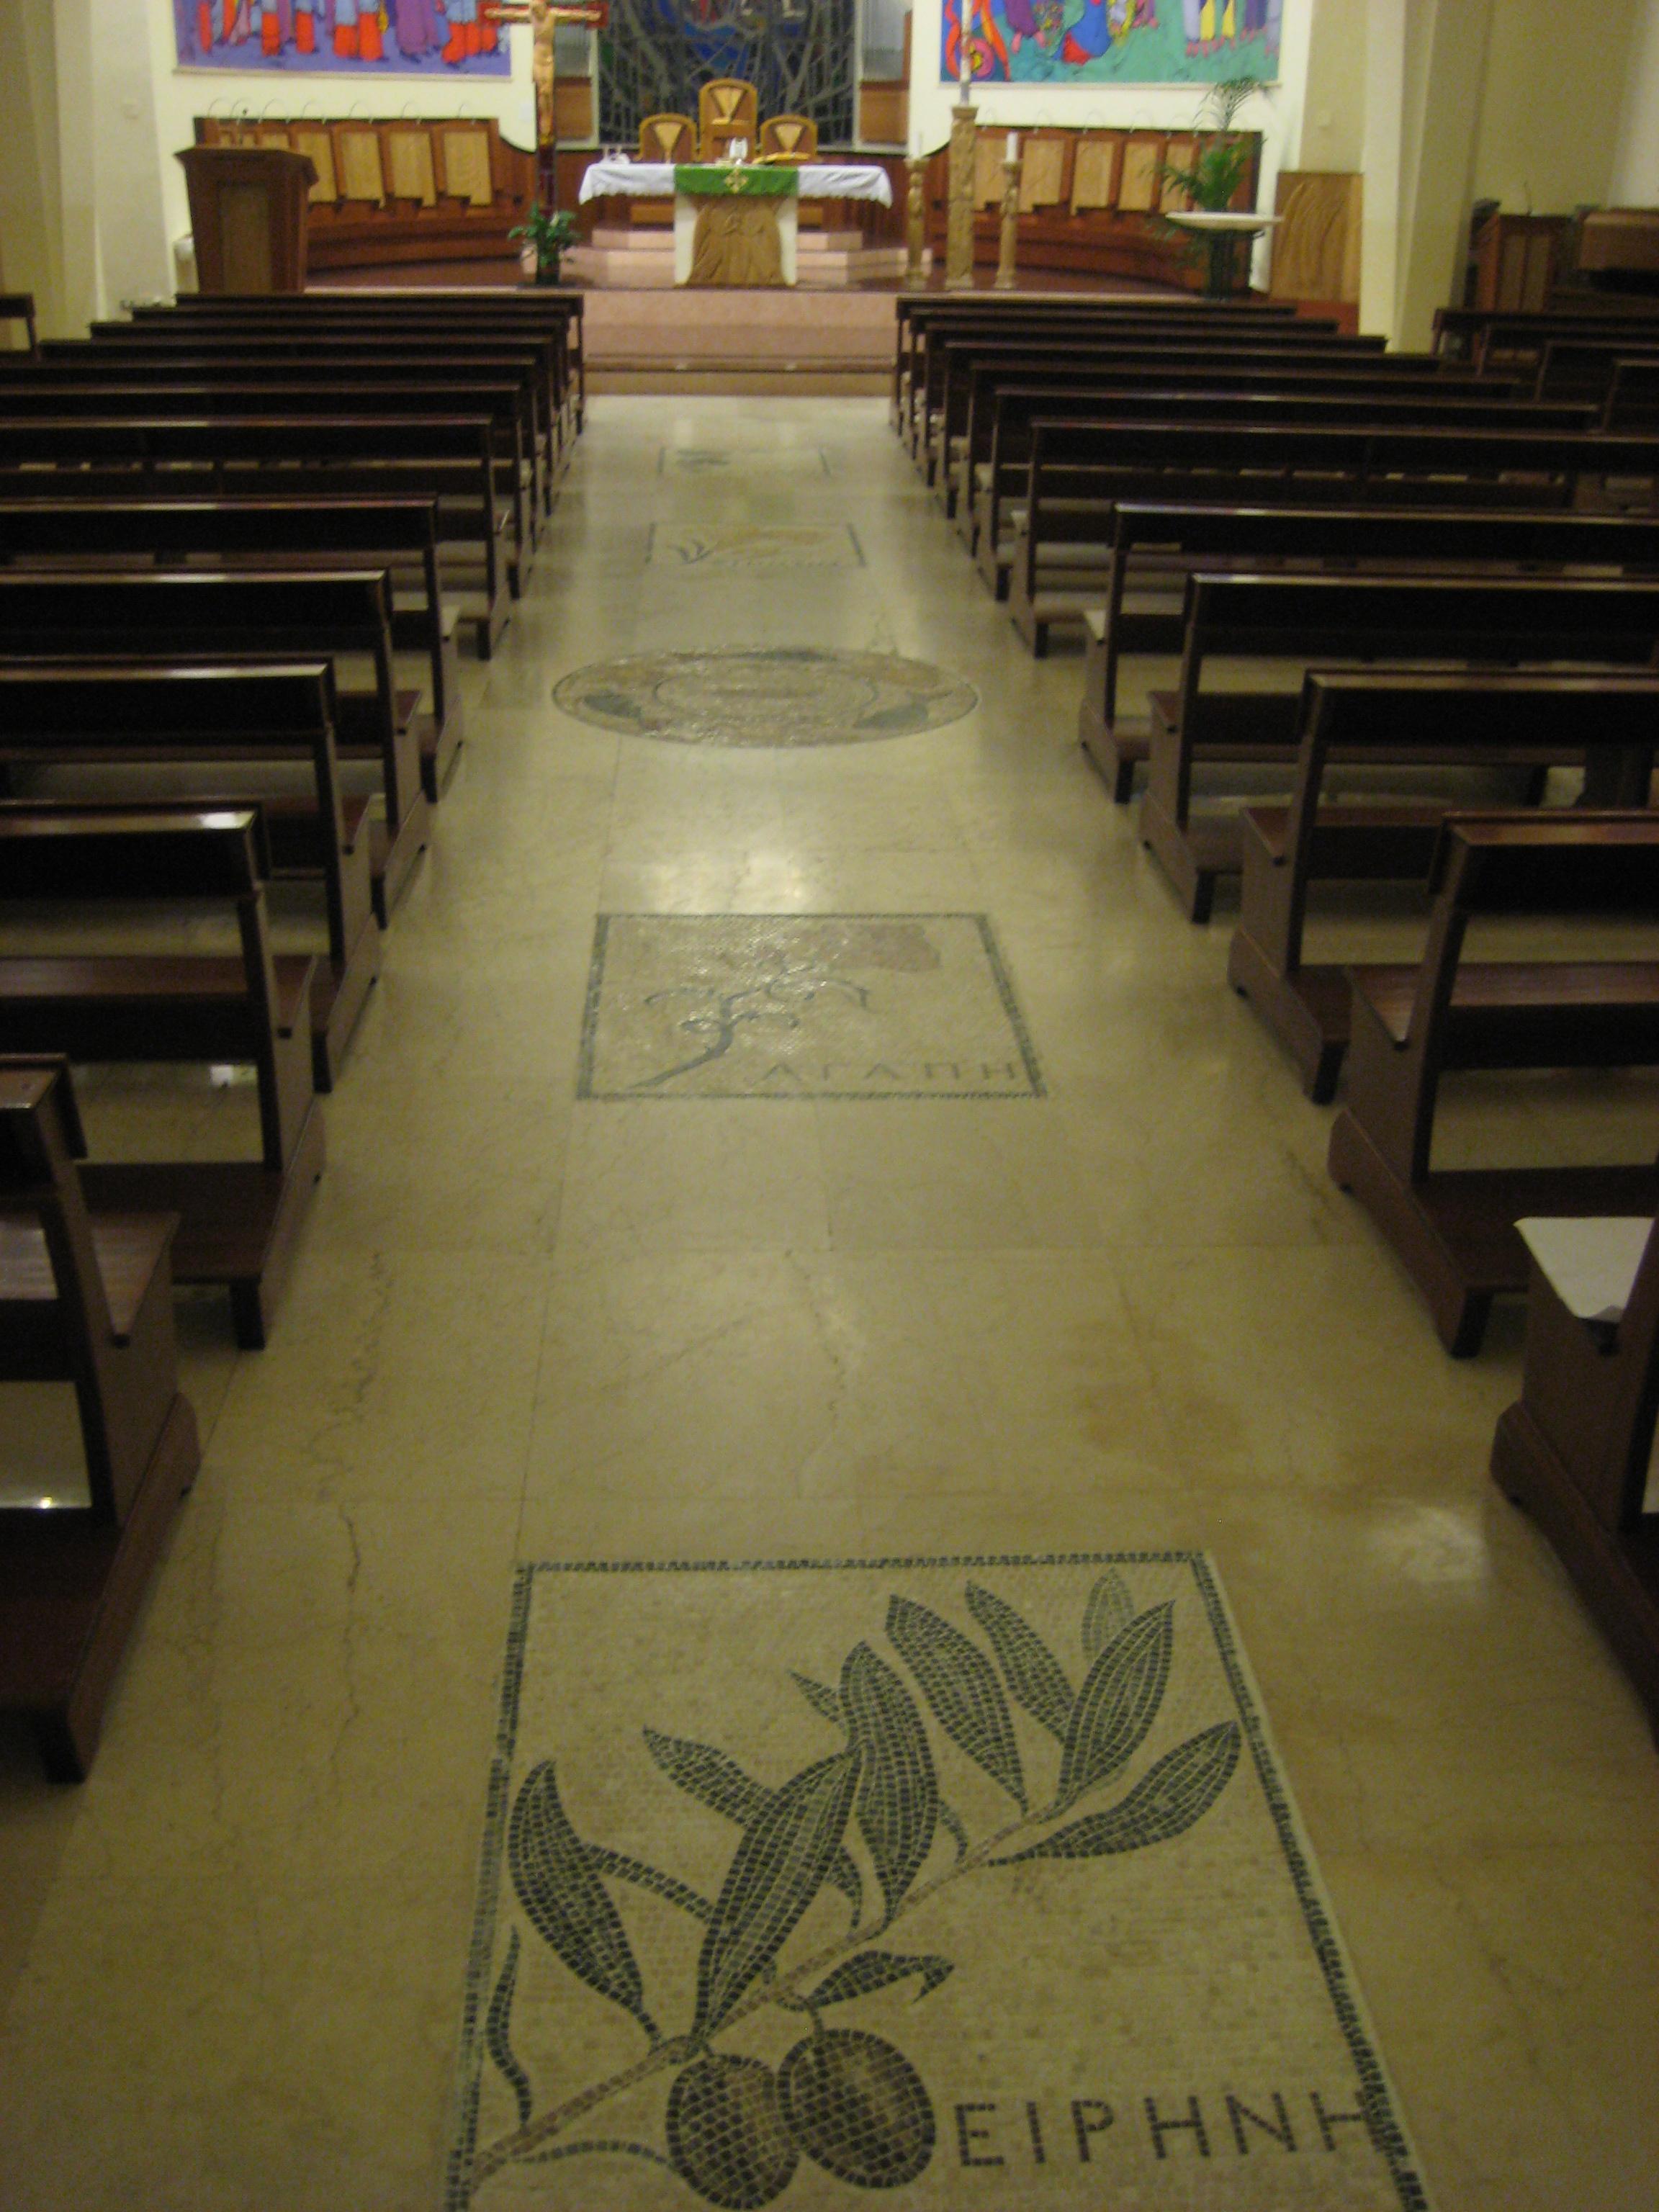 danjel kosma opere in gesso ForArredo Sacro Cruciverba